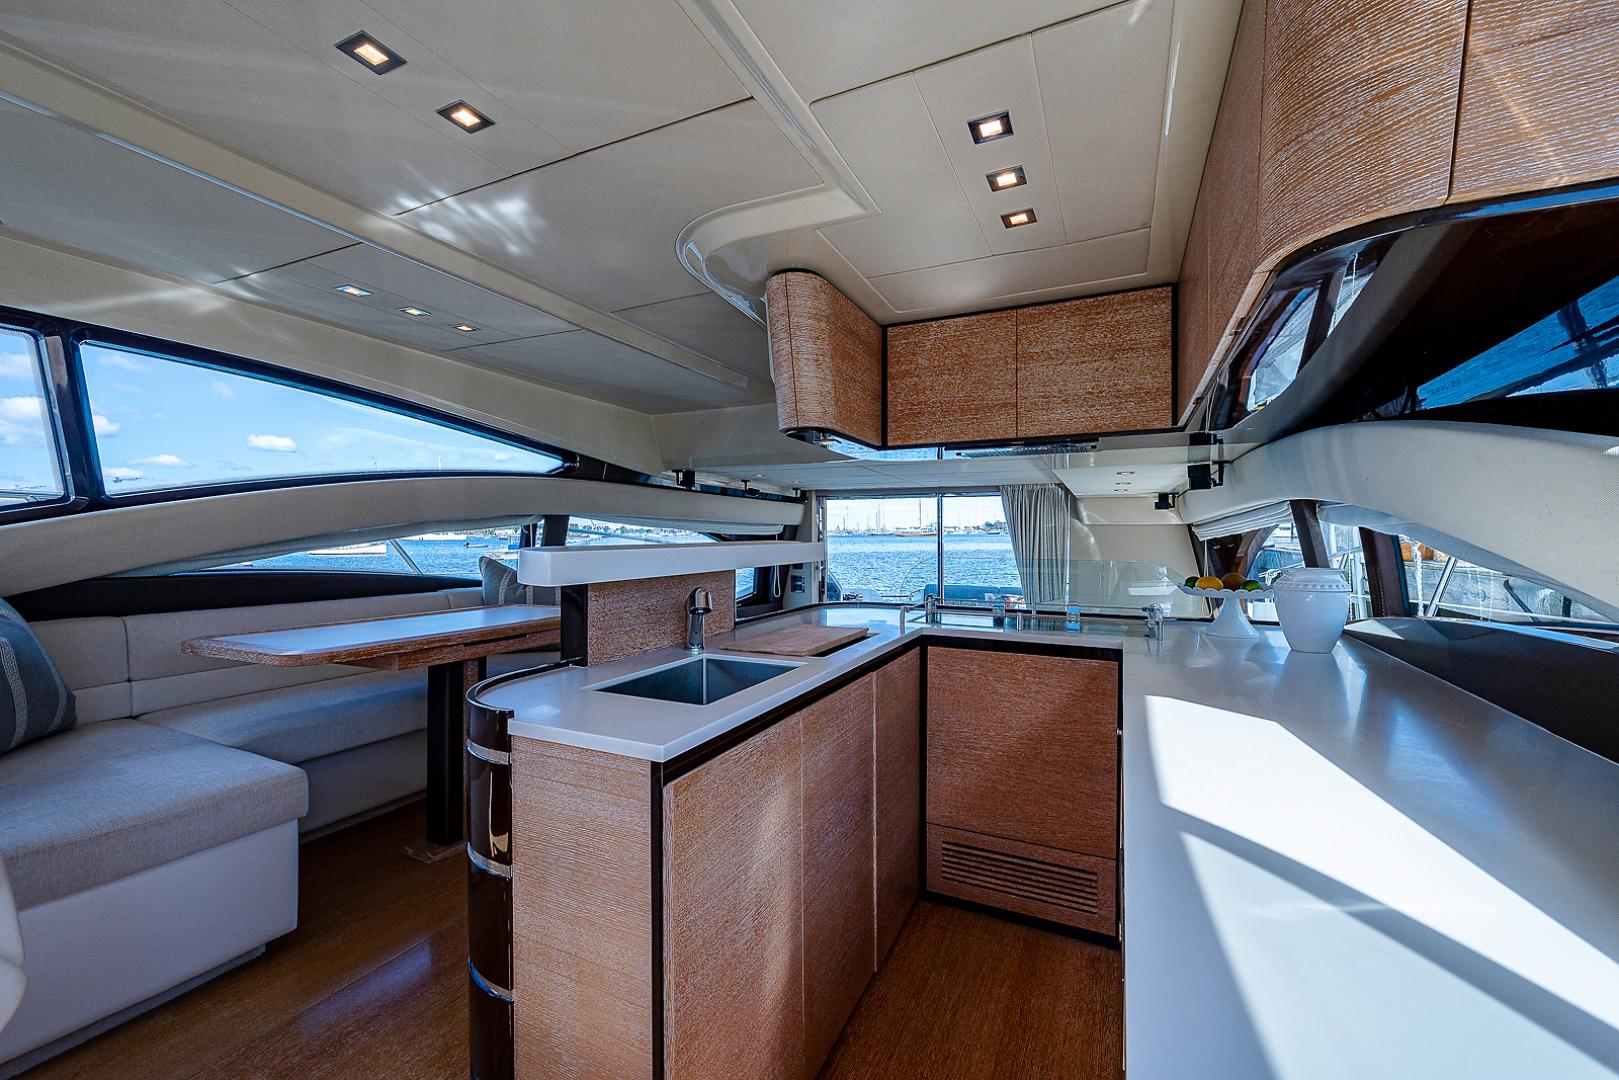 Azimut-58 Fly Motor Yacht 2011-Nova Fort Lauderdale-Florida-United States-58_azimut_nova__galley12-1490530 | Thumbnail